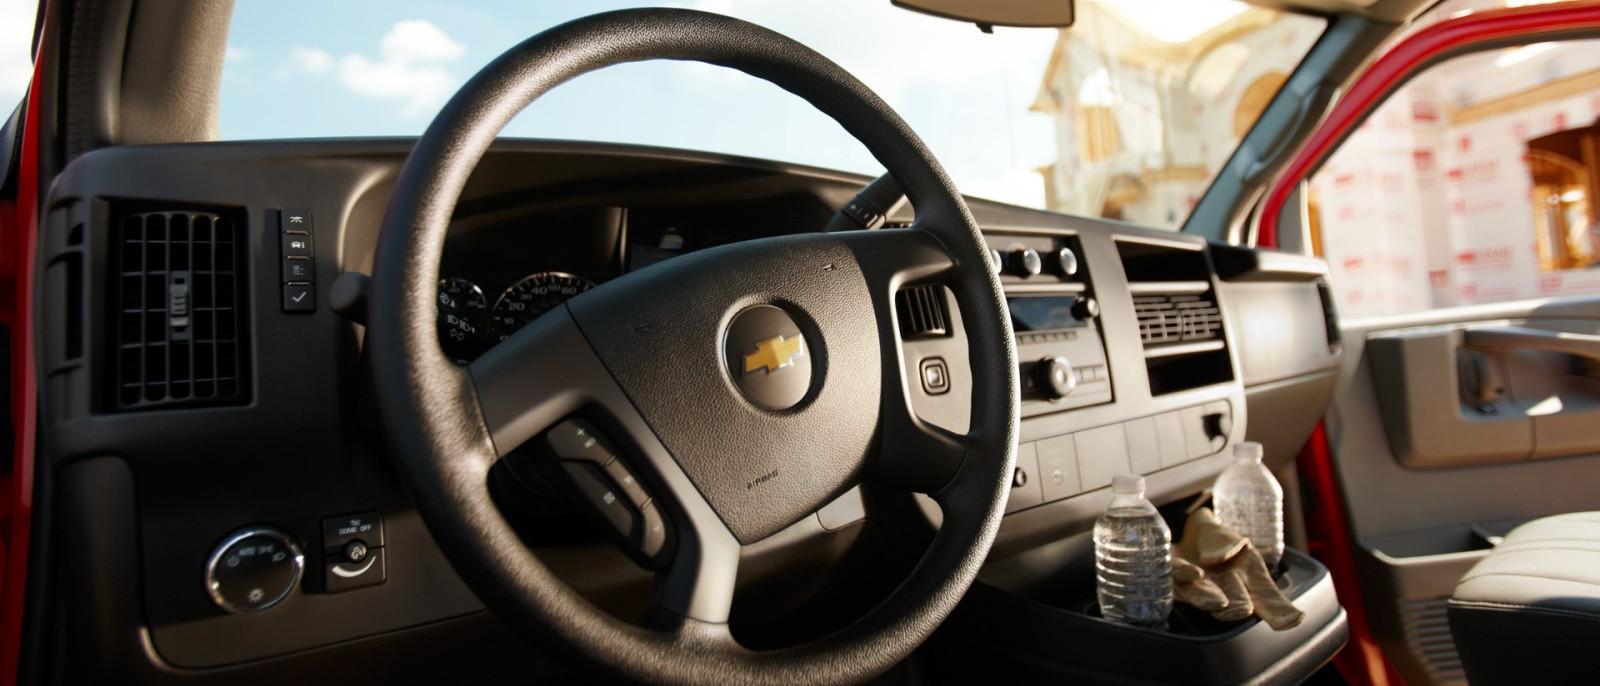 2014 Chevy Express Interior